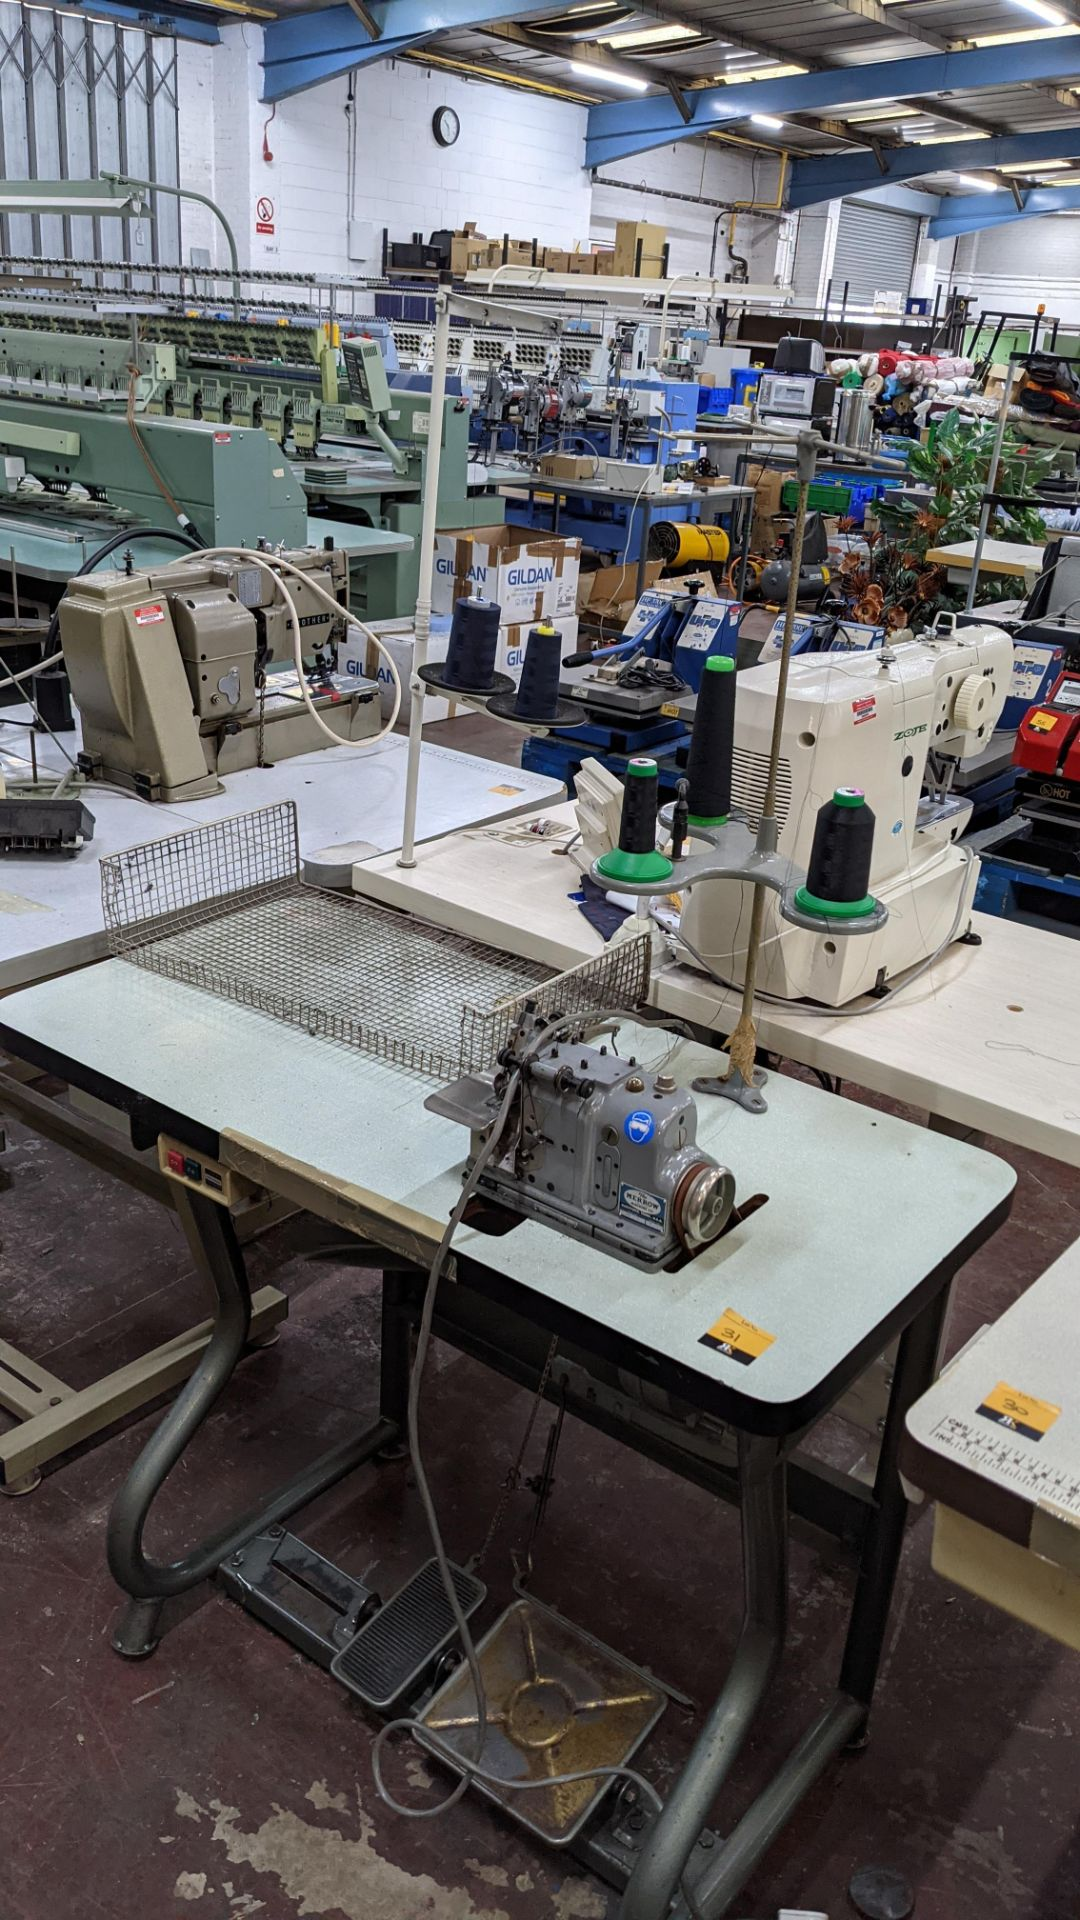 Merrow sewing machine, model M-30 - Image 3 of 14